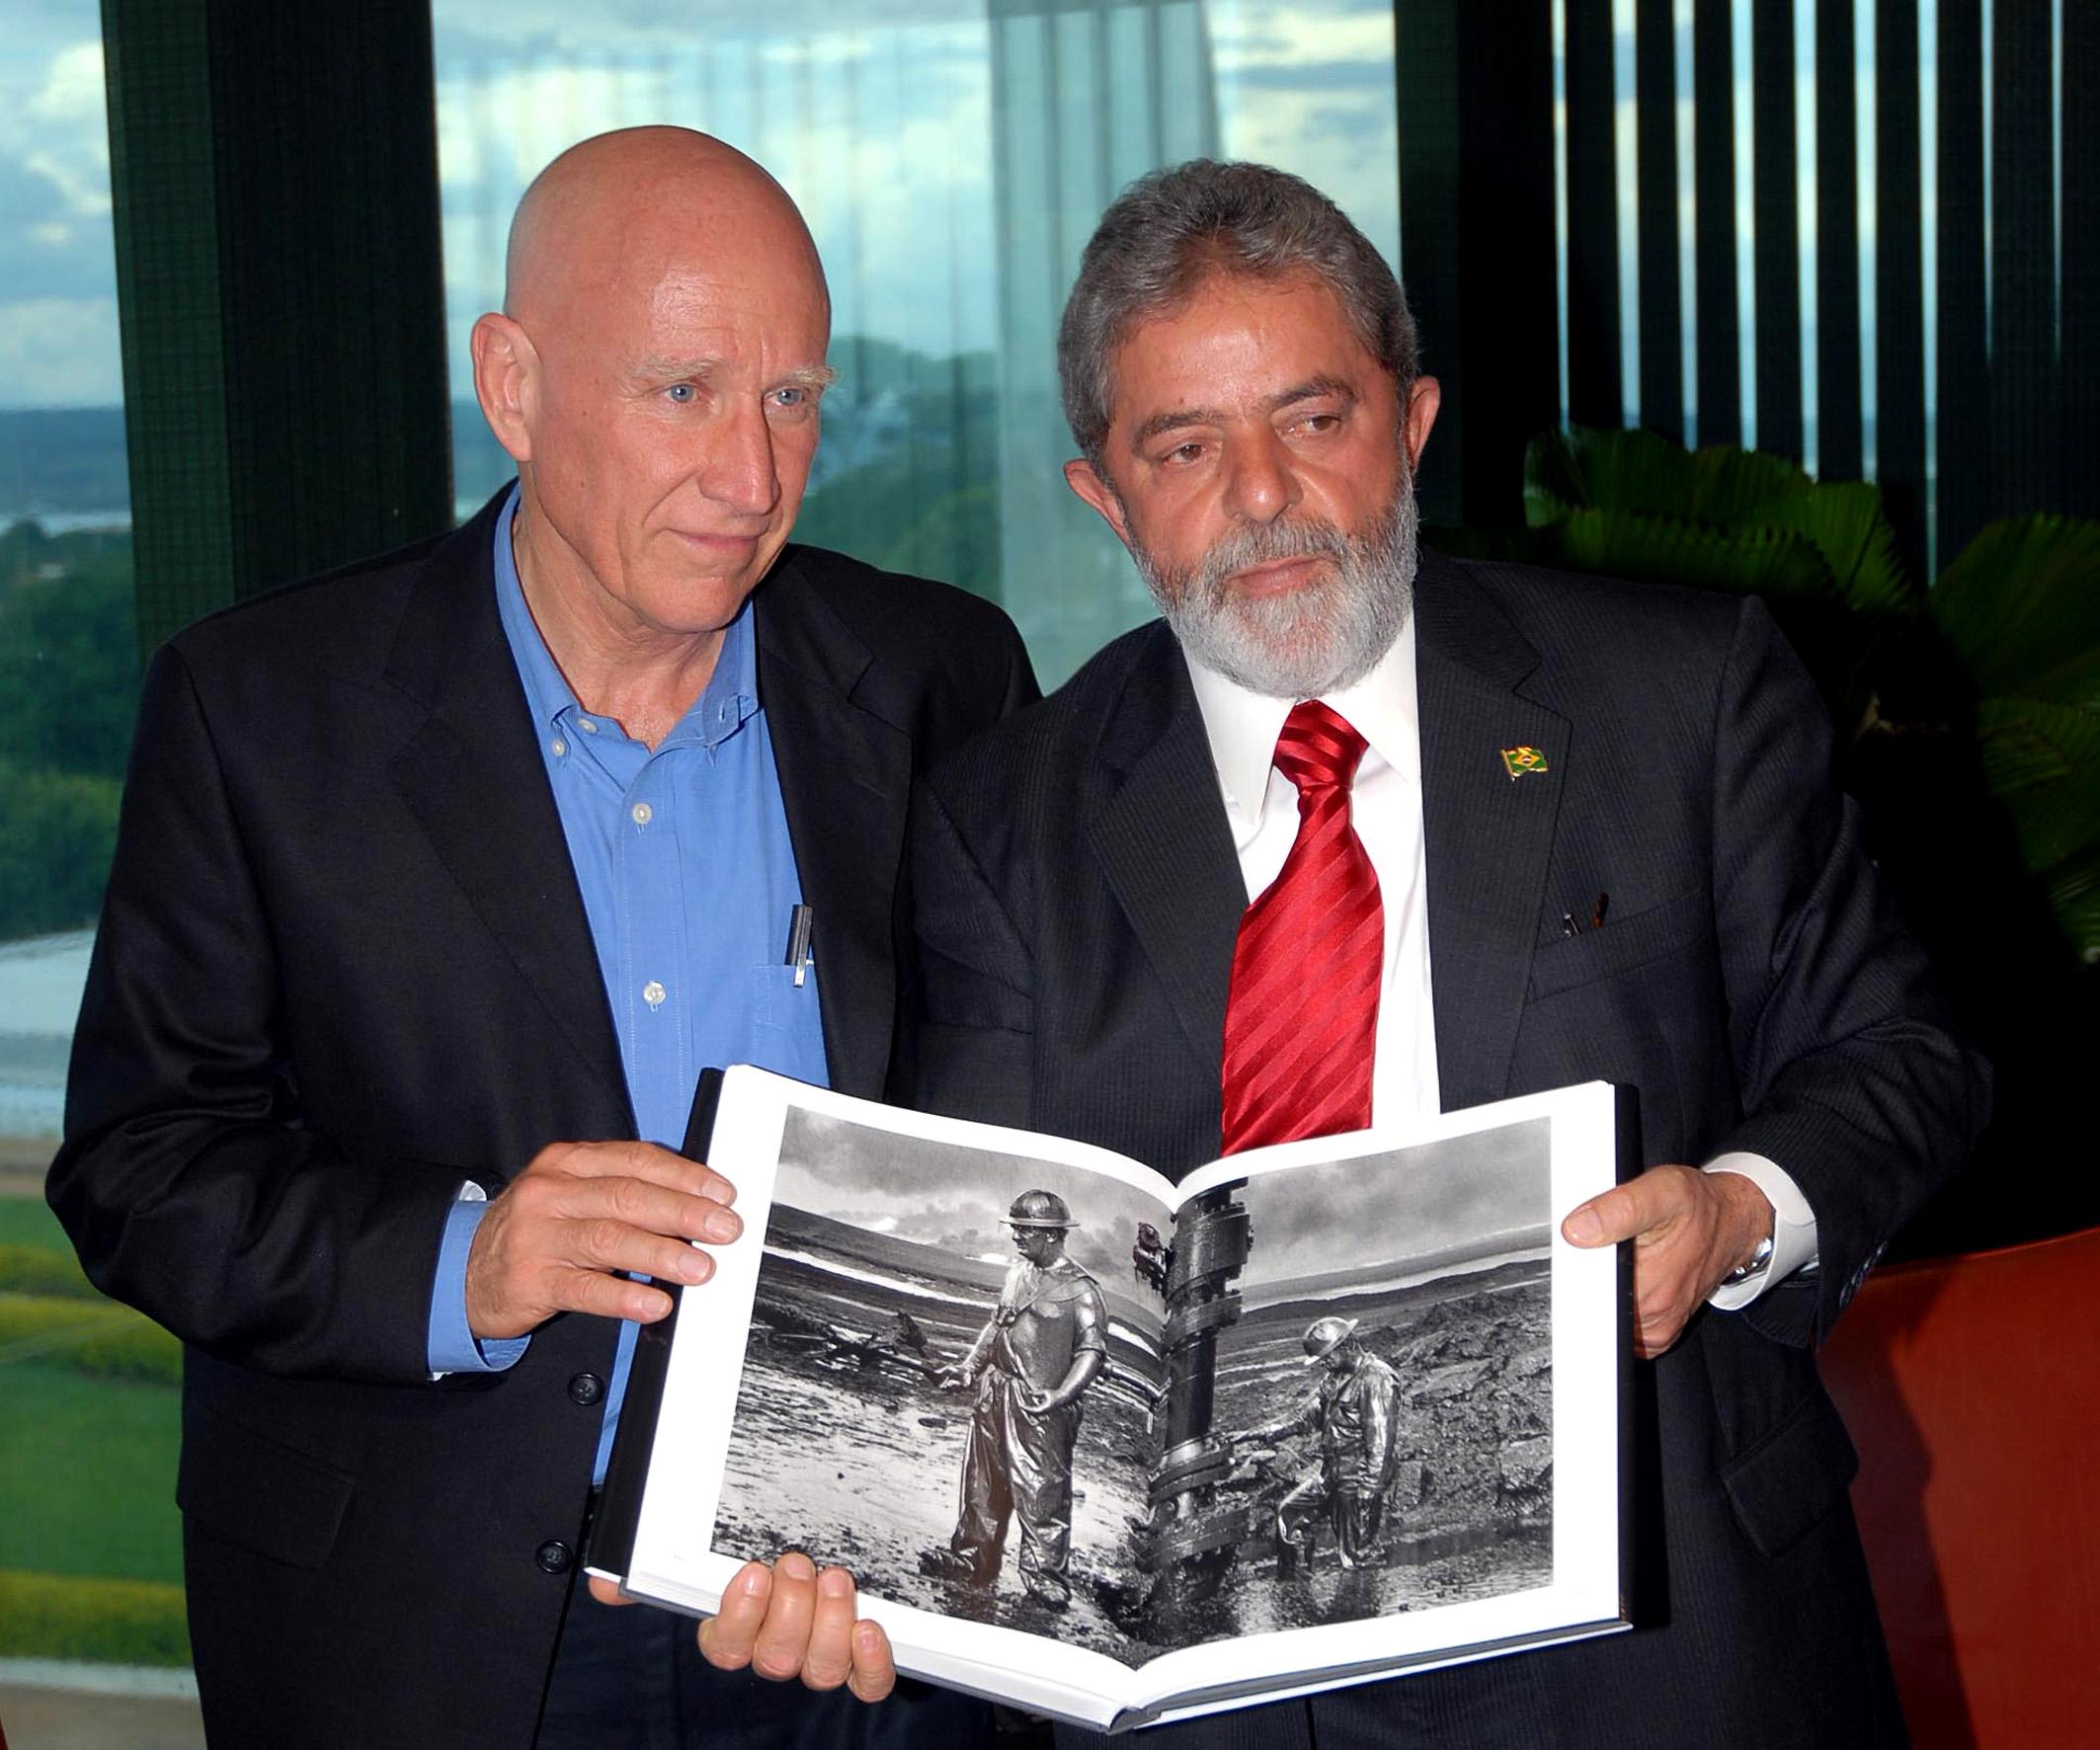 Image of Sebastião Salgado from Wikidata